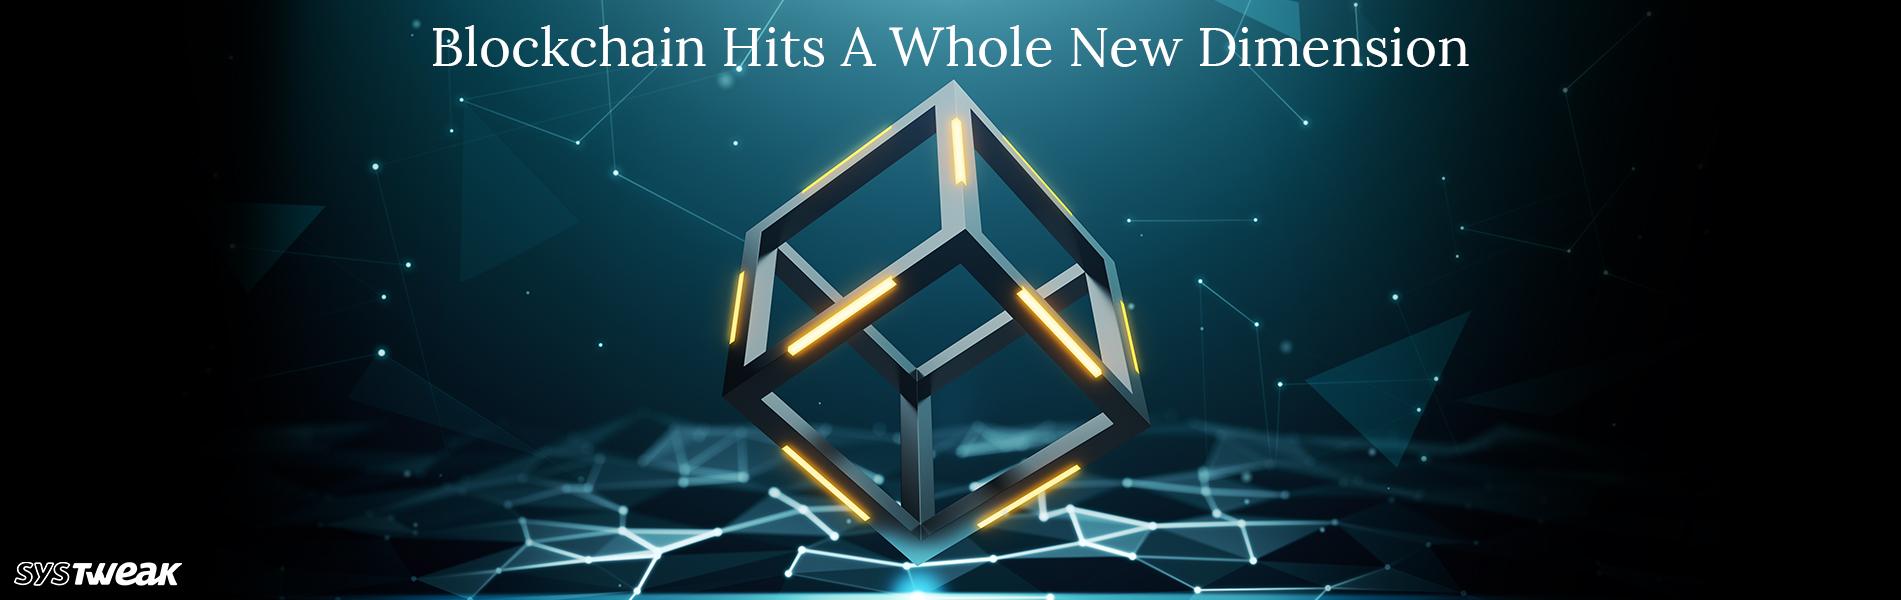 BlockChain Moving Towards A New Start